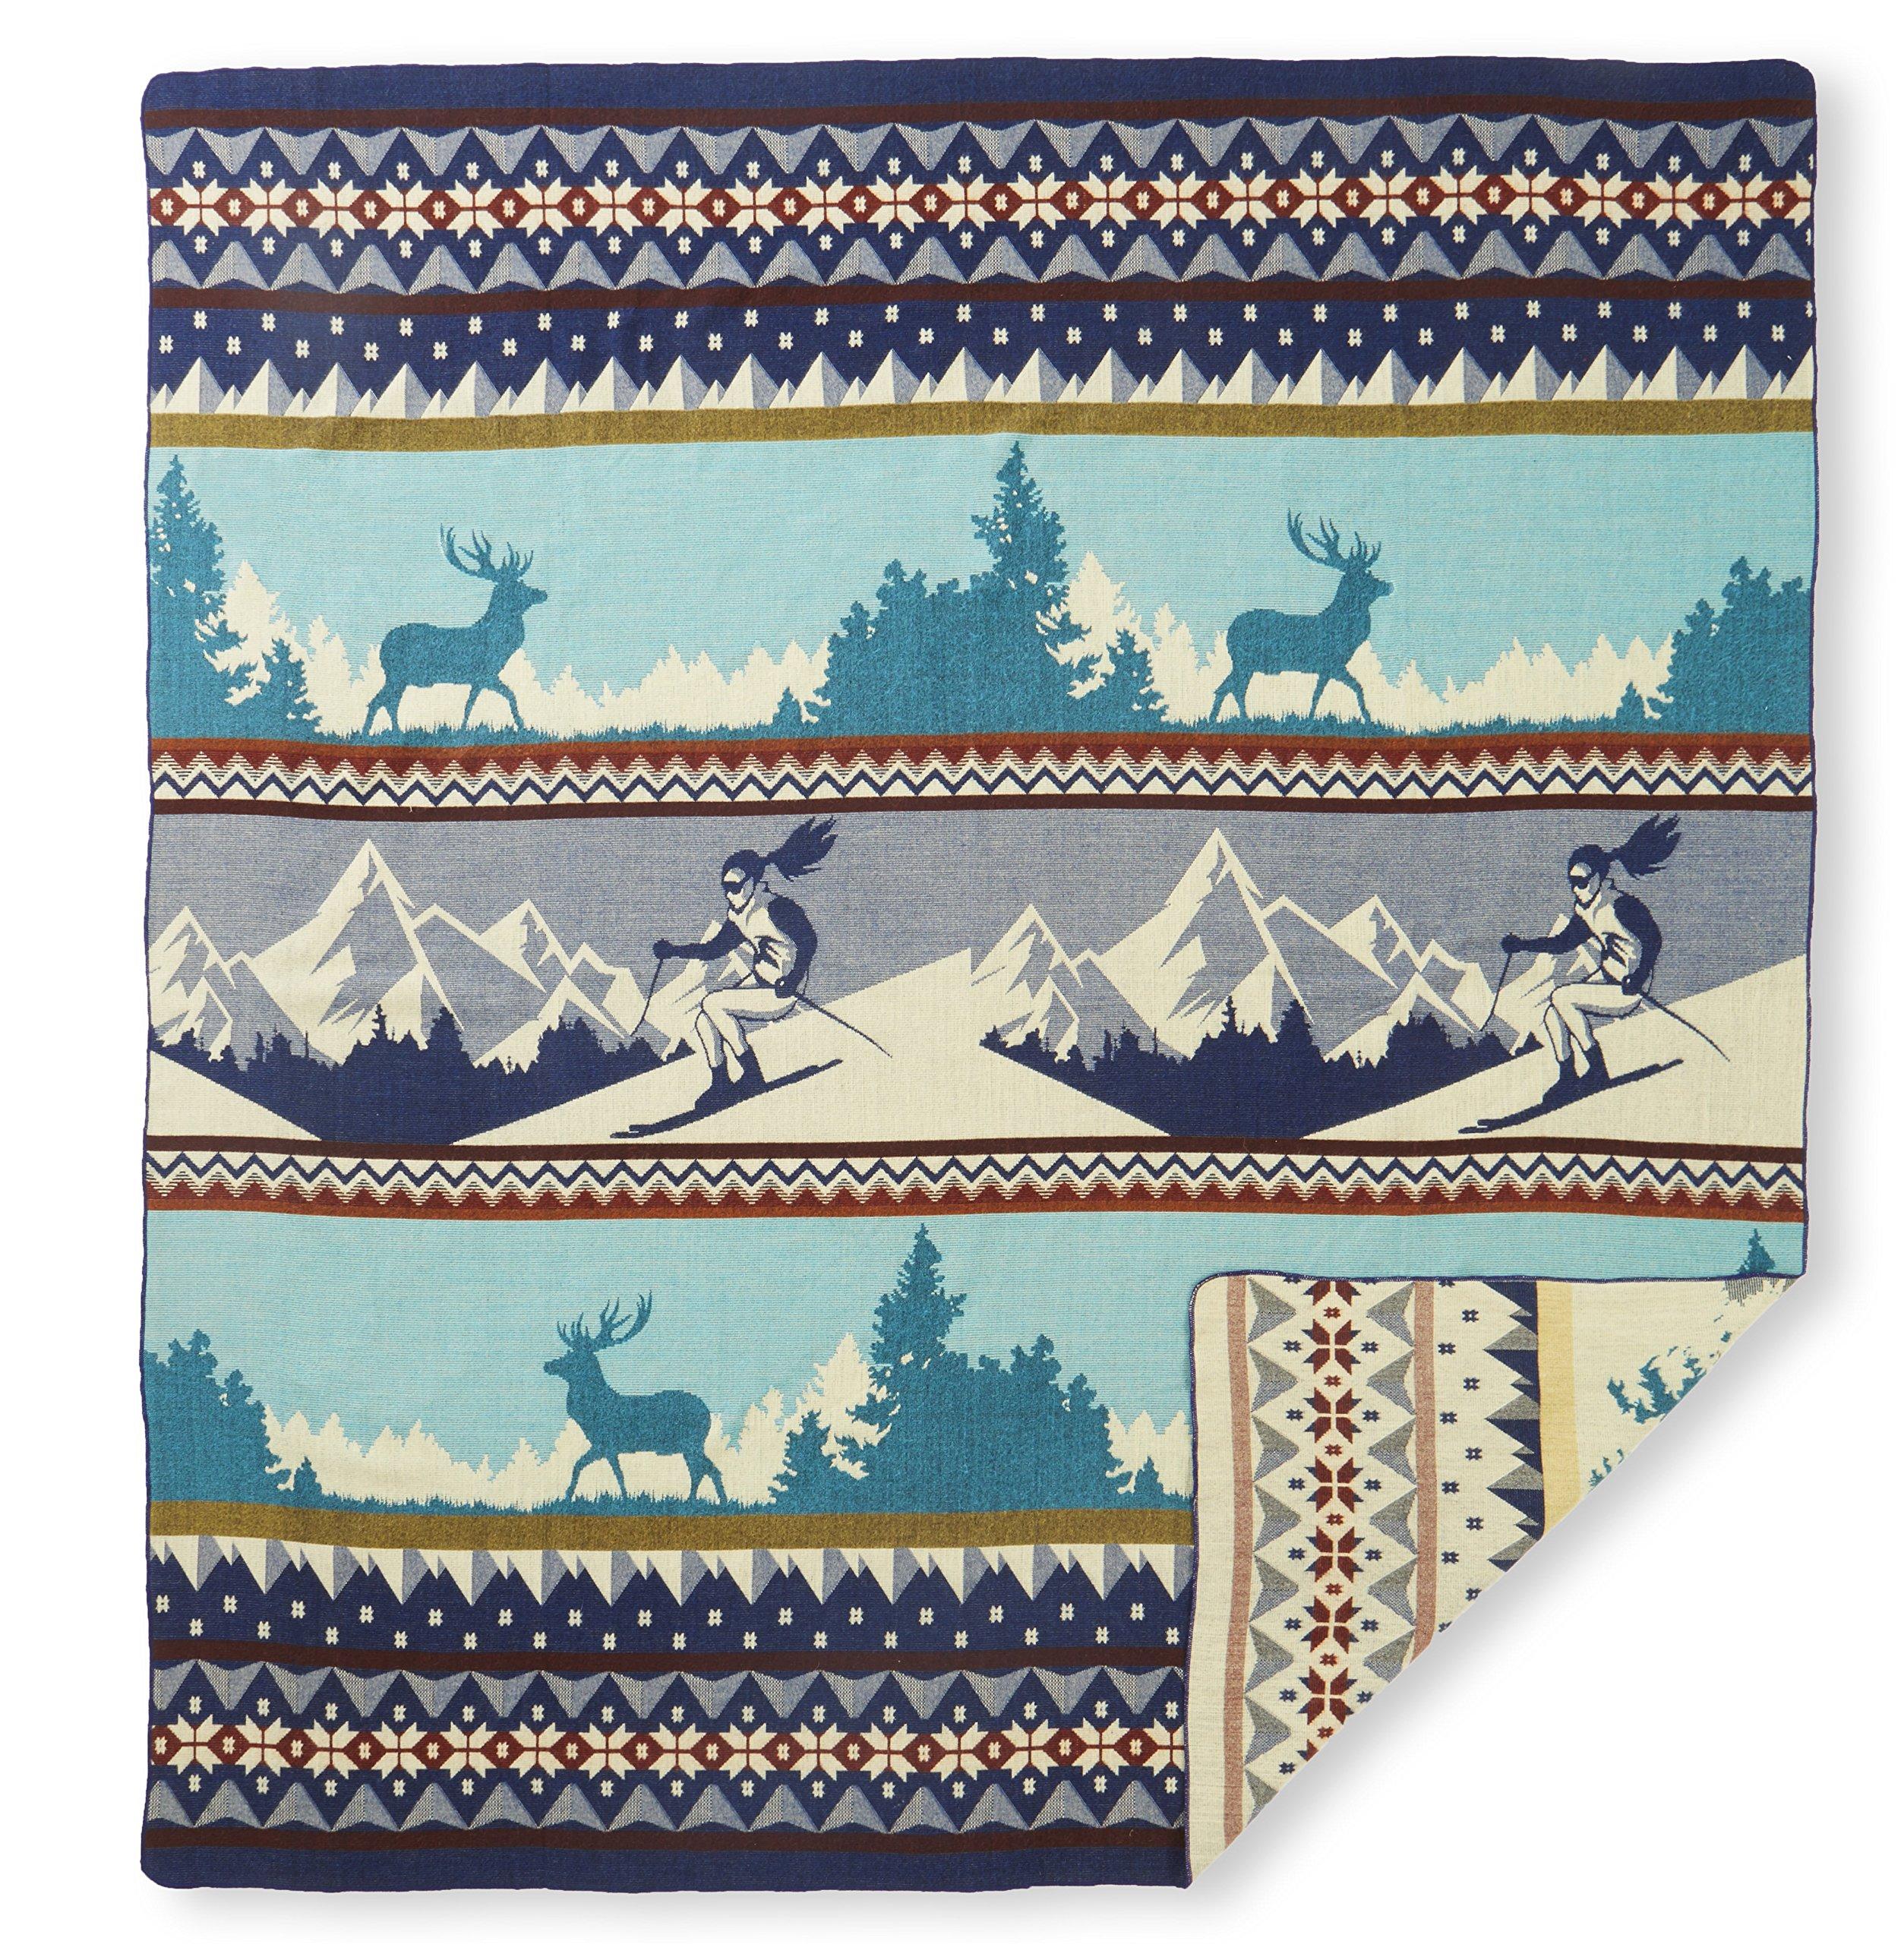 Ecuadane Colorado Ski Large Woven blanket